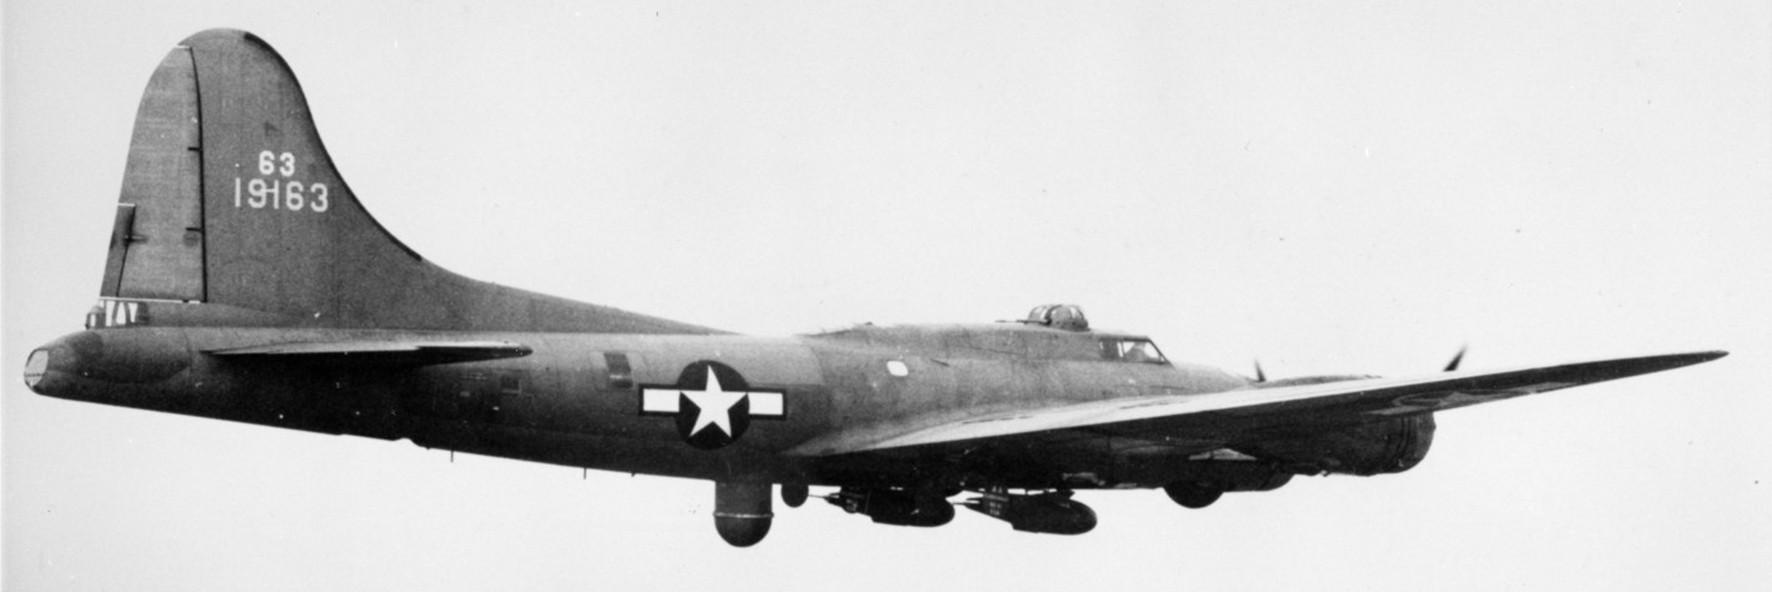 B-17 #41-9163